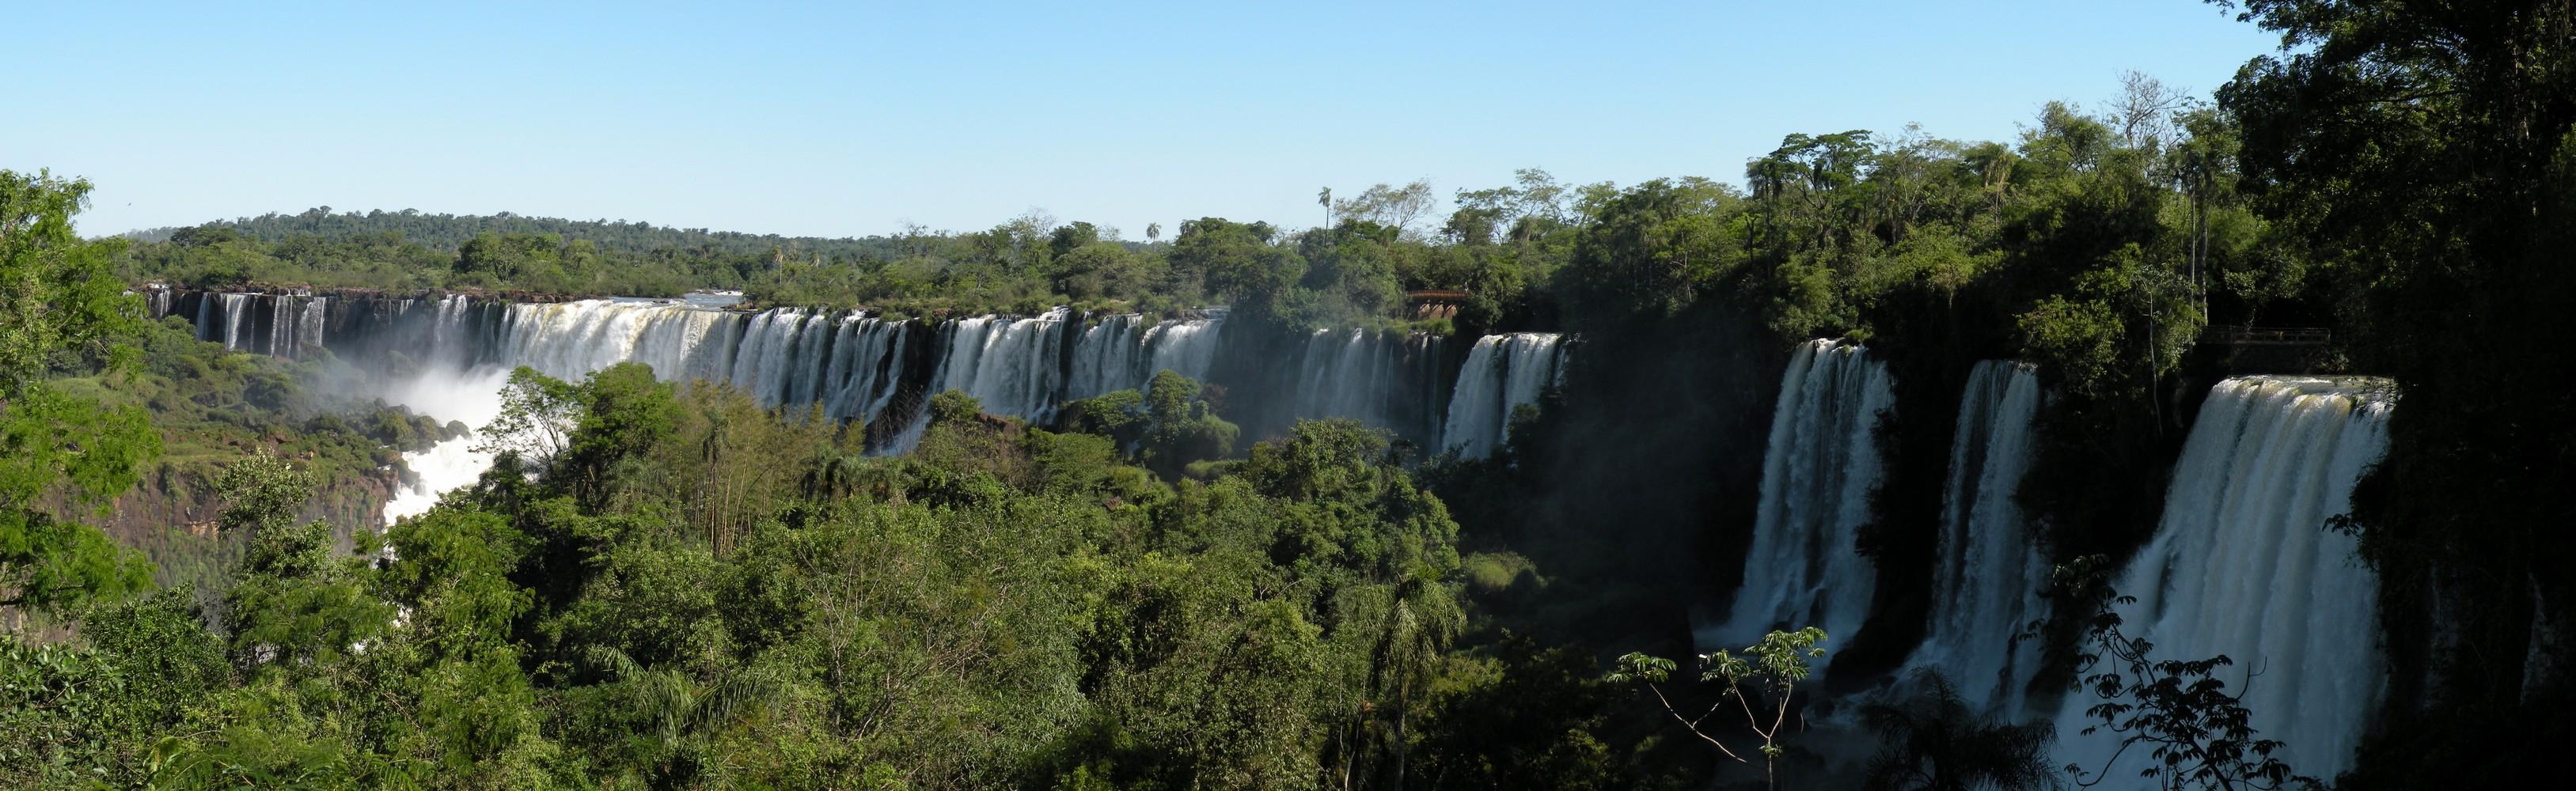 Circuito Superior - Parque Nacional Iguazú